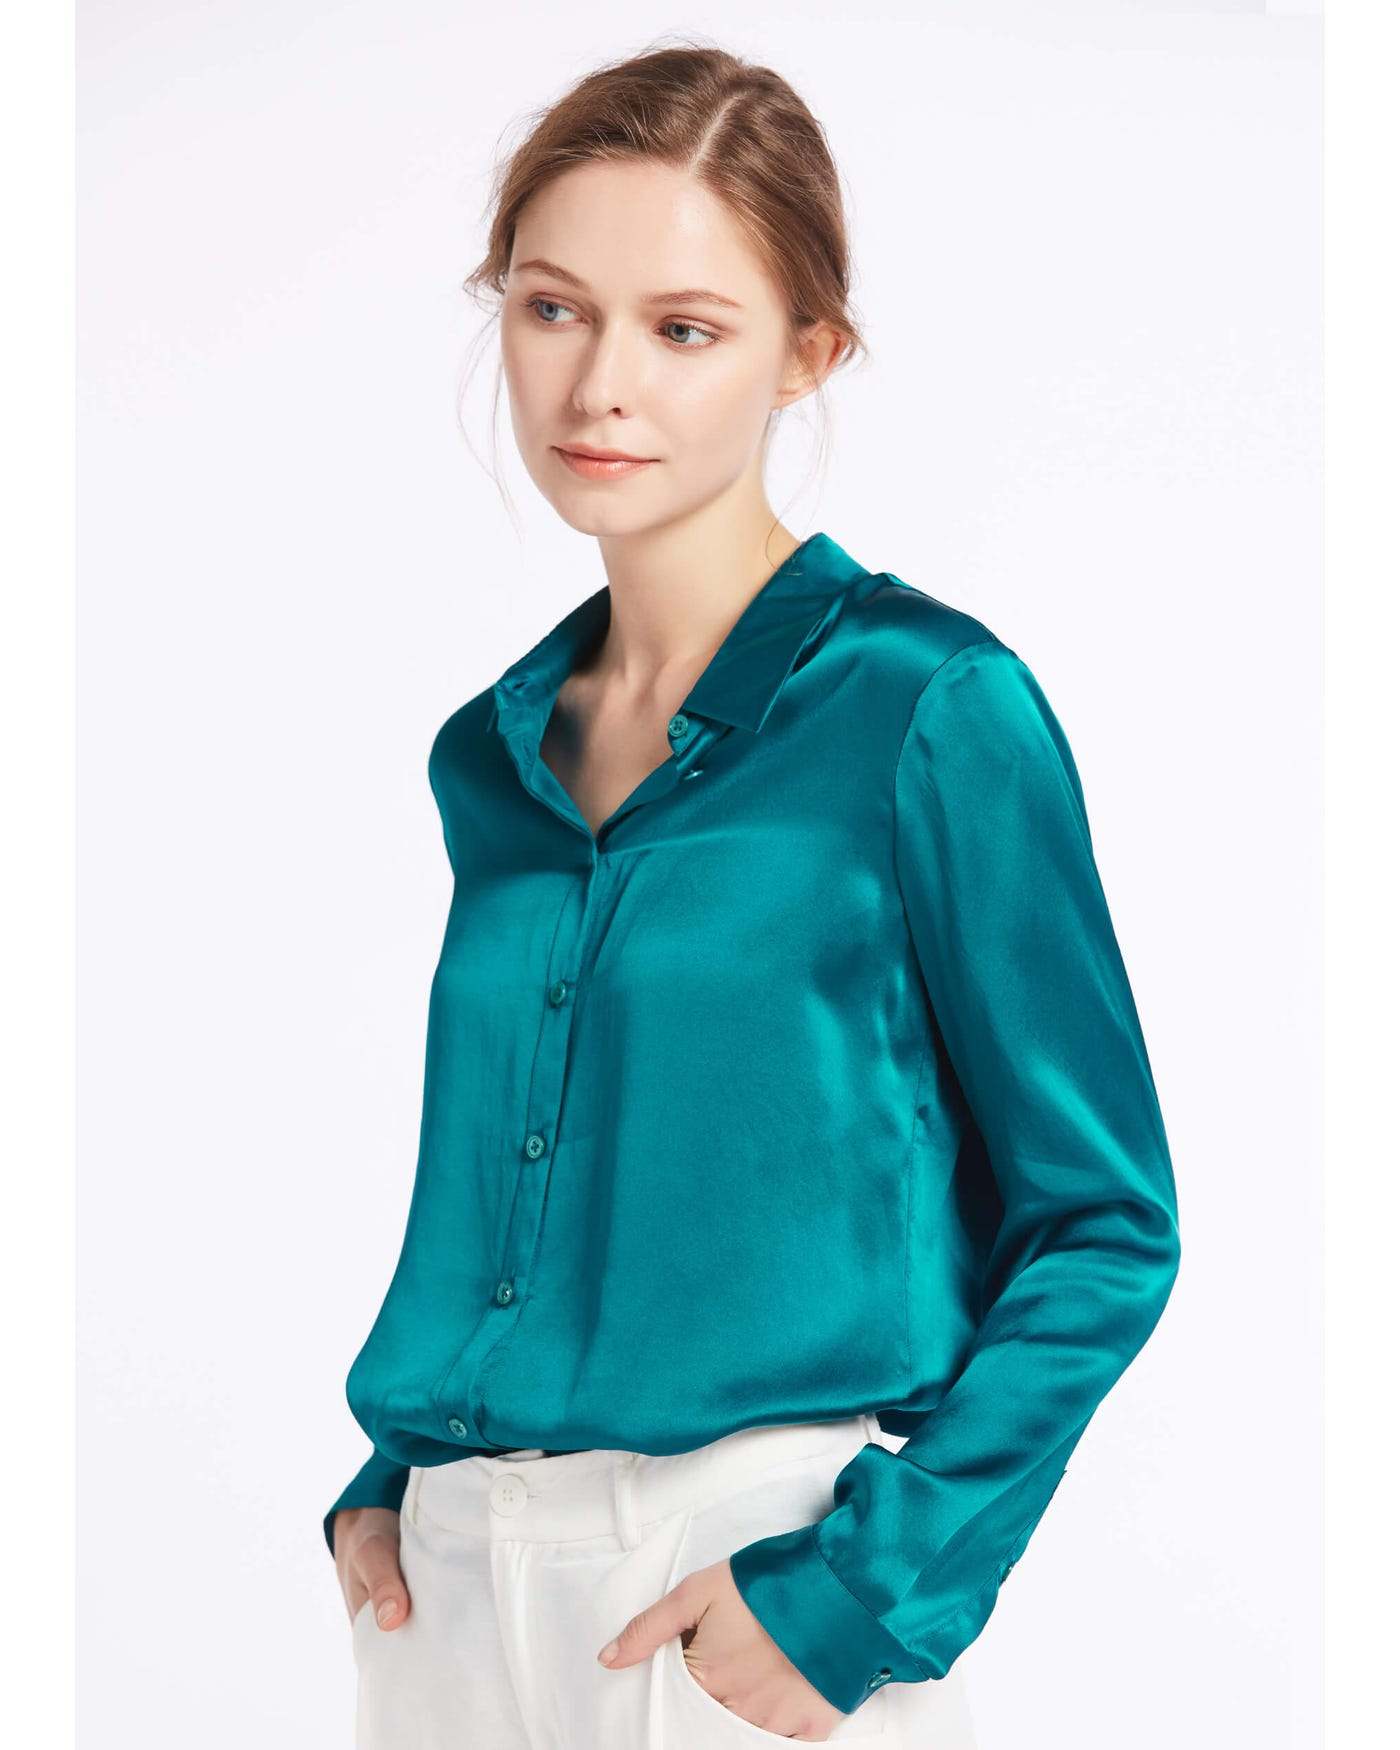 using Silk Shirt